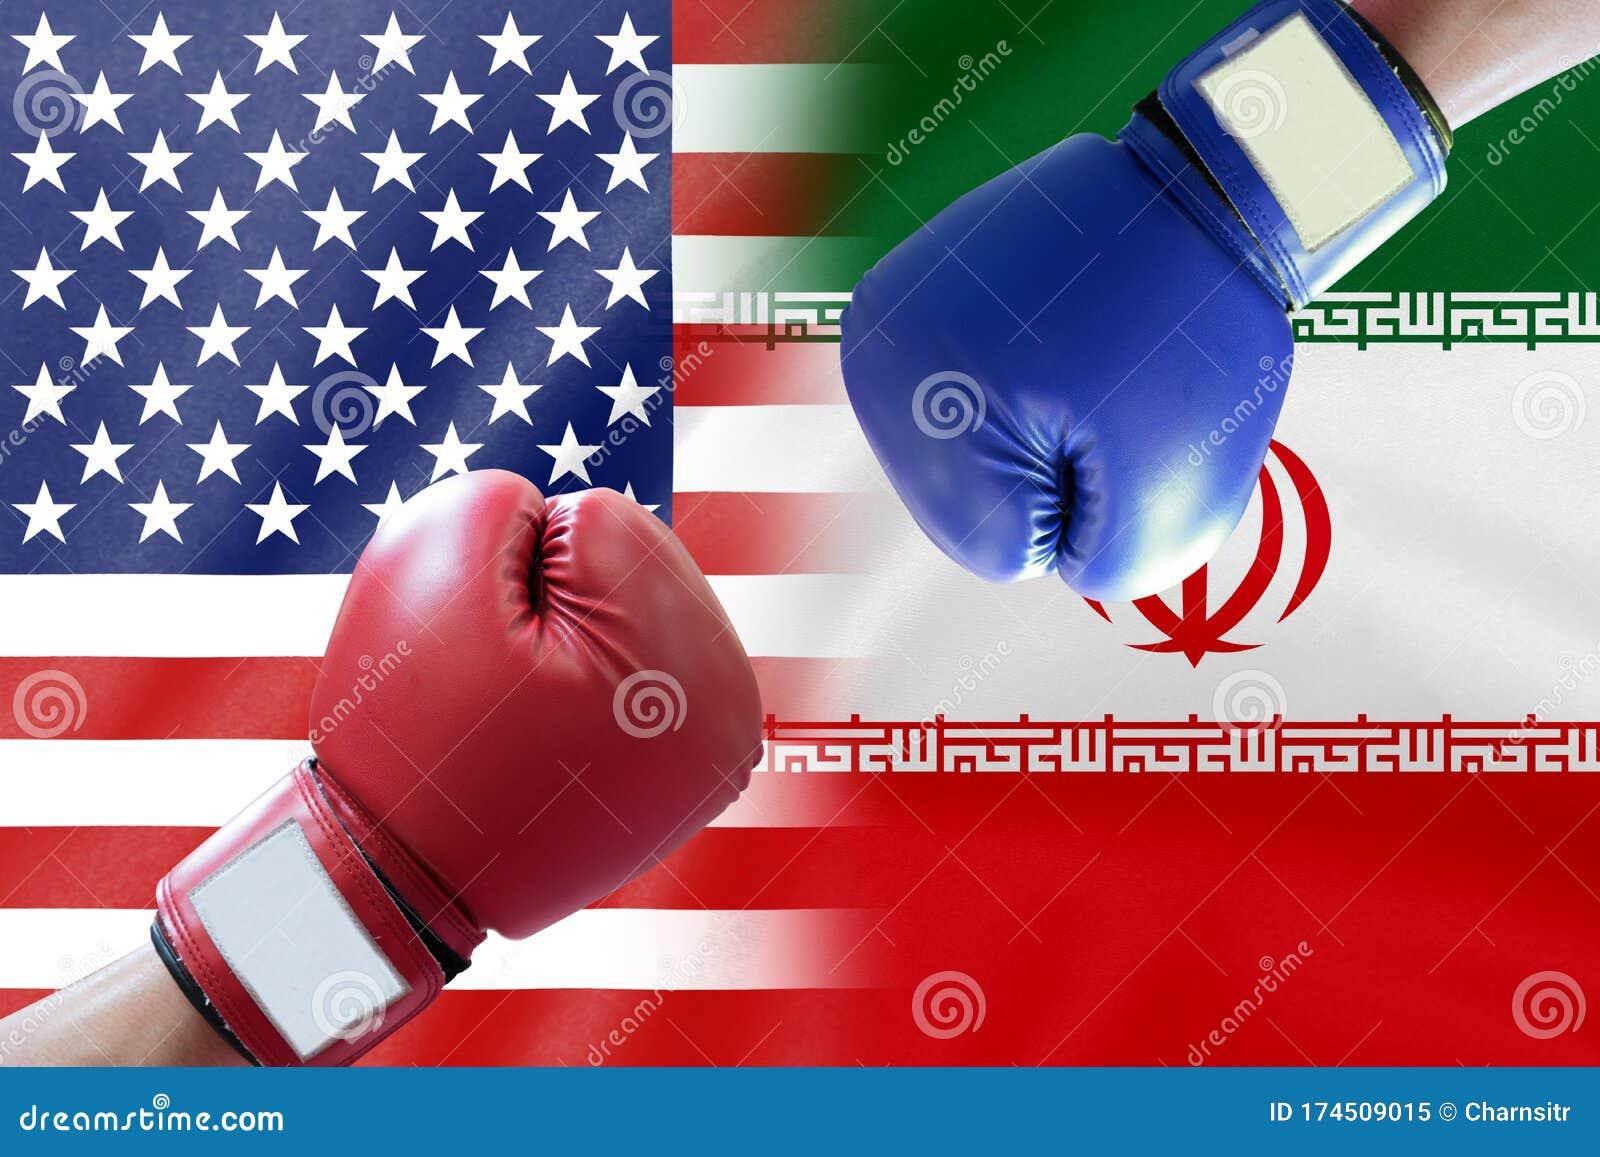 Boxing Glove On Half US Half Iran Flag Stock Image - Image of emblem,  folds: 174509015